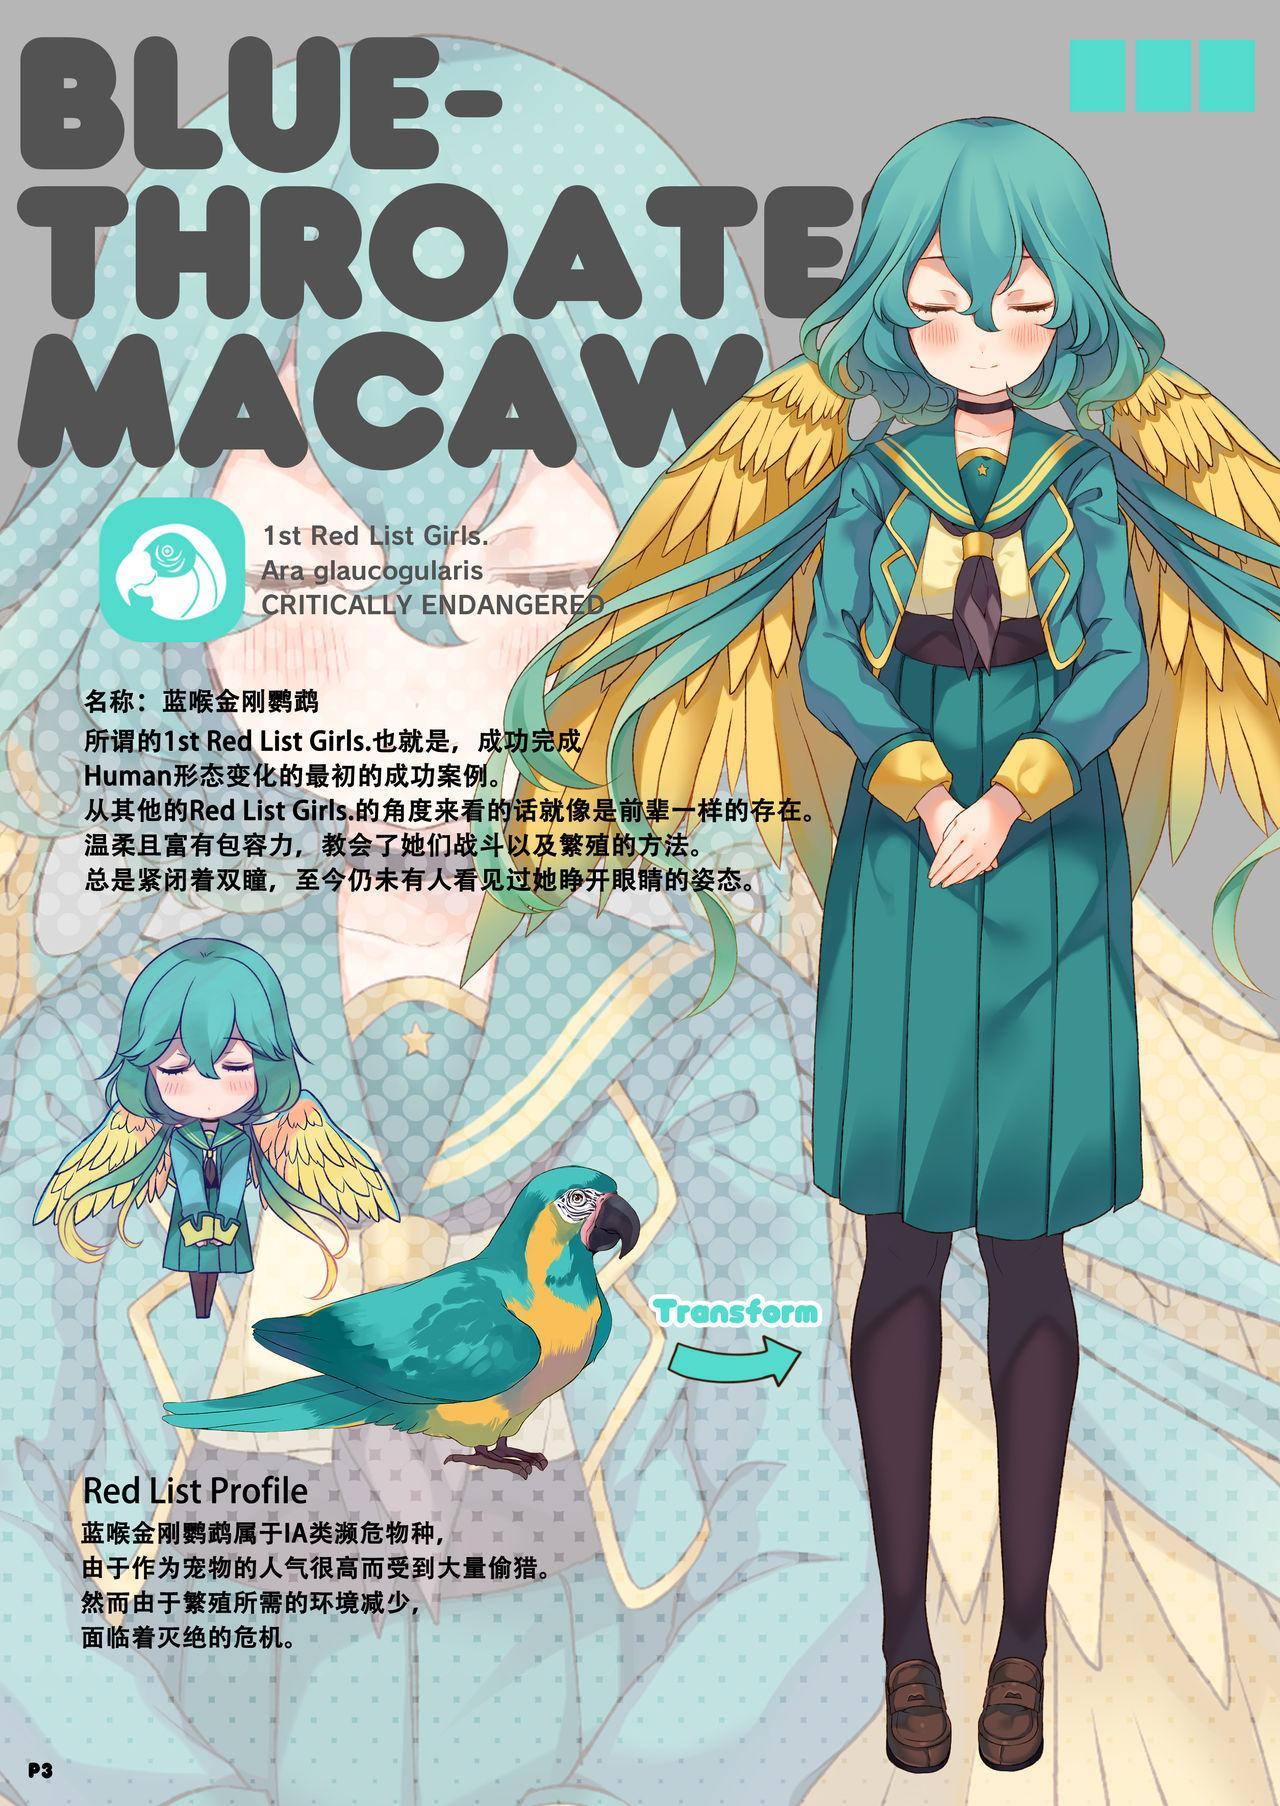 MACAW;EDUCATION 3